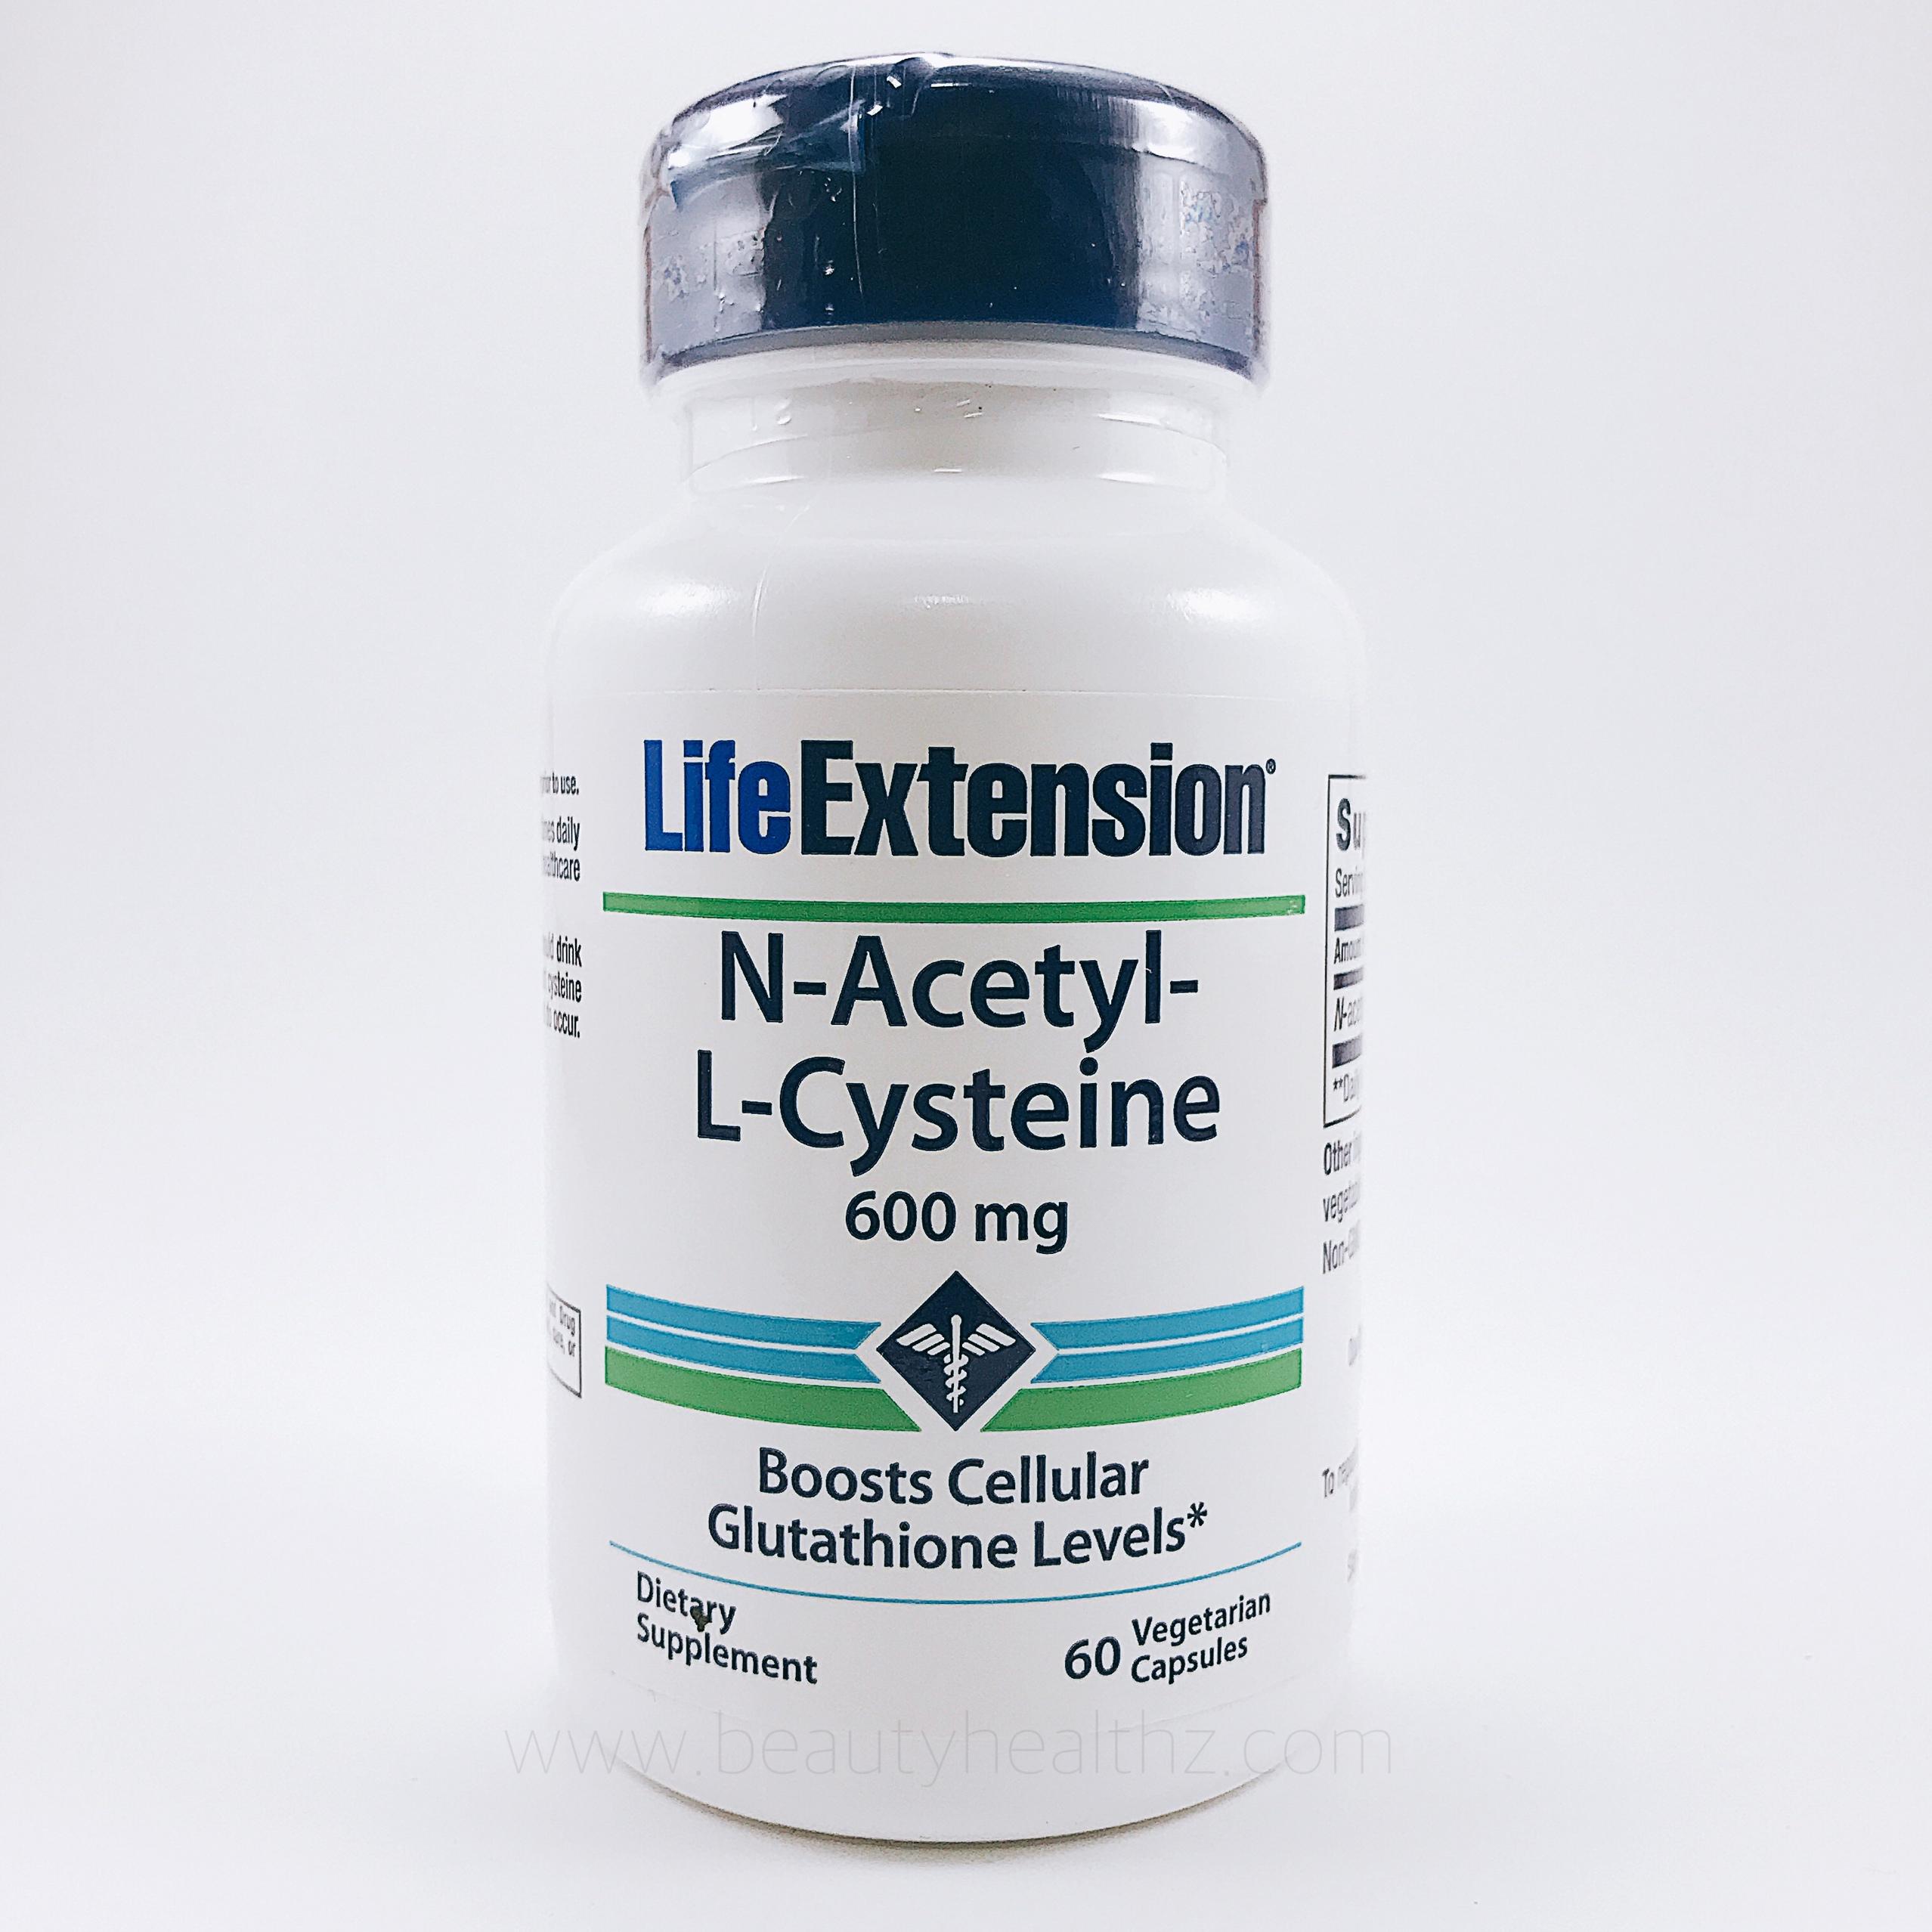 Life Extension, N-Acetyl-L-Cysteine, 600 mg, 60 Veggie Caps